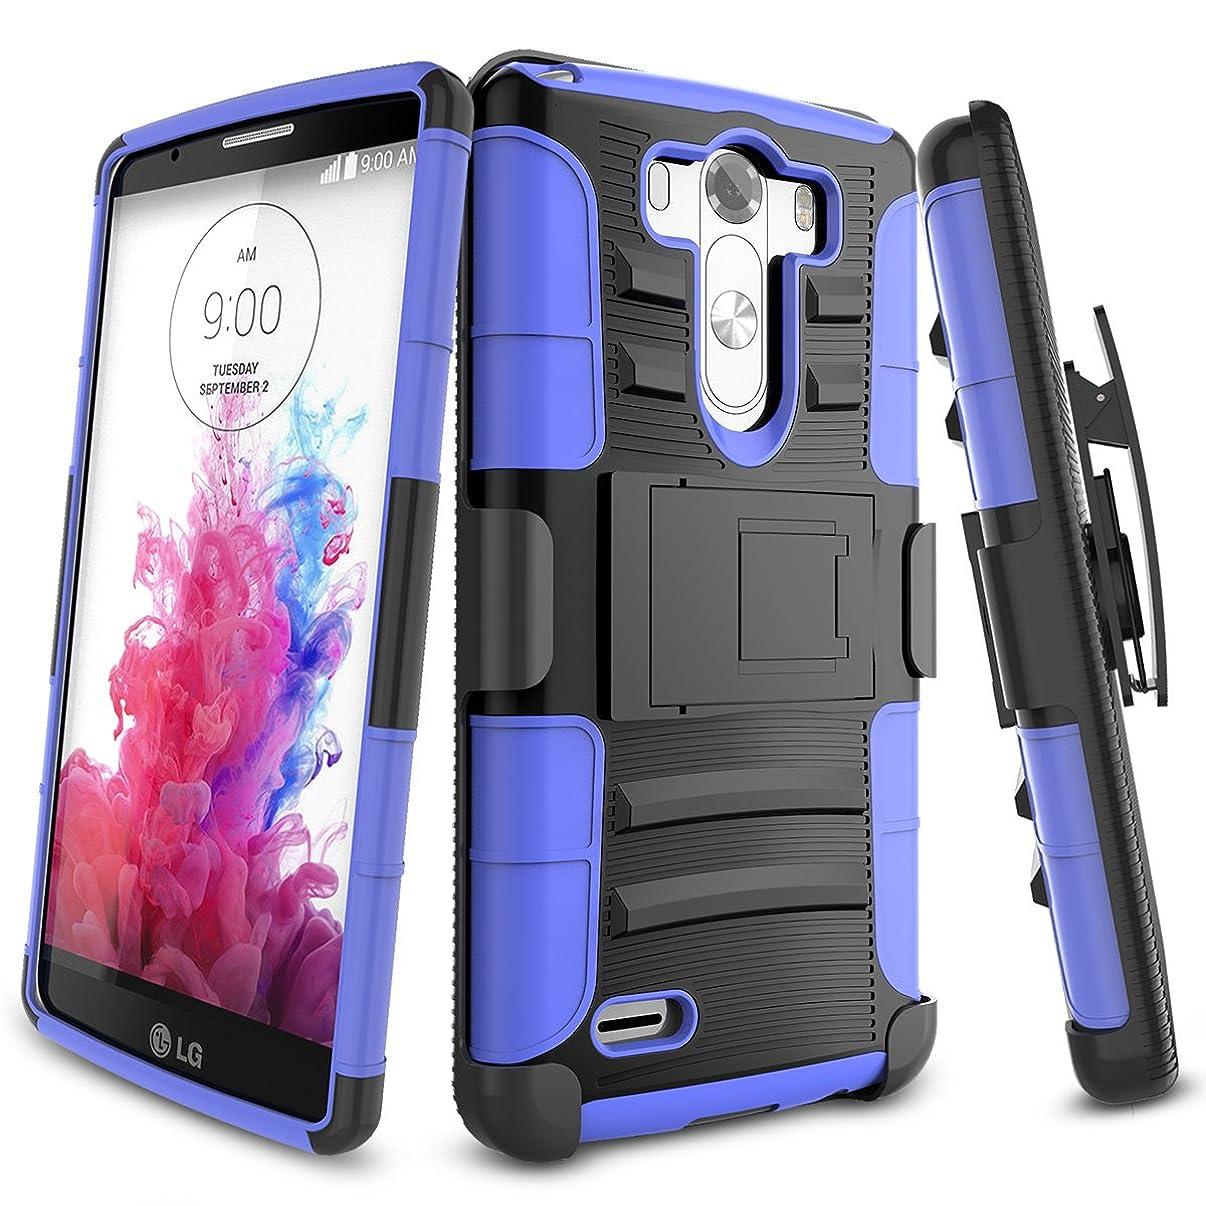 LG G3 Case,TILL [Knight Armor] Heavy Duty Full-body Rugged Holster Resilient Armor Case [Belt Swivel Clip][Kickstand] Combo Cover Shell For LG G3 Phone AT&T T-mobile Sprint Verizon Unlocked [Blue]